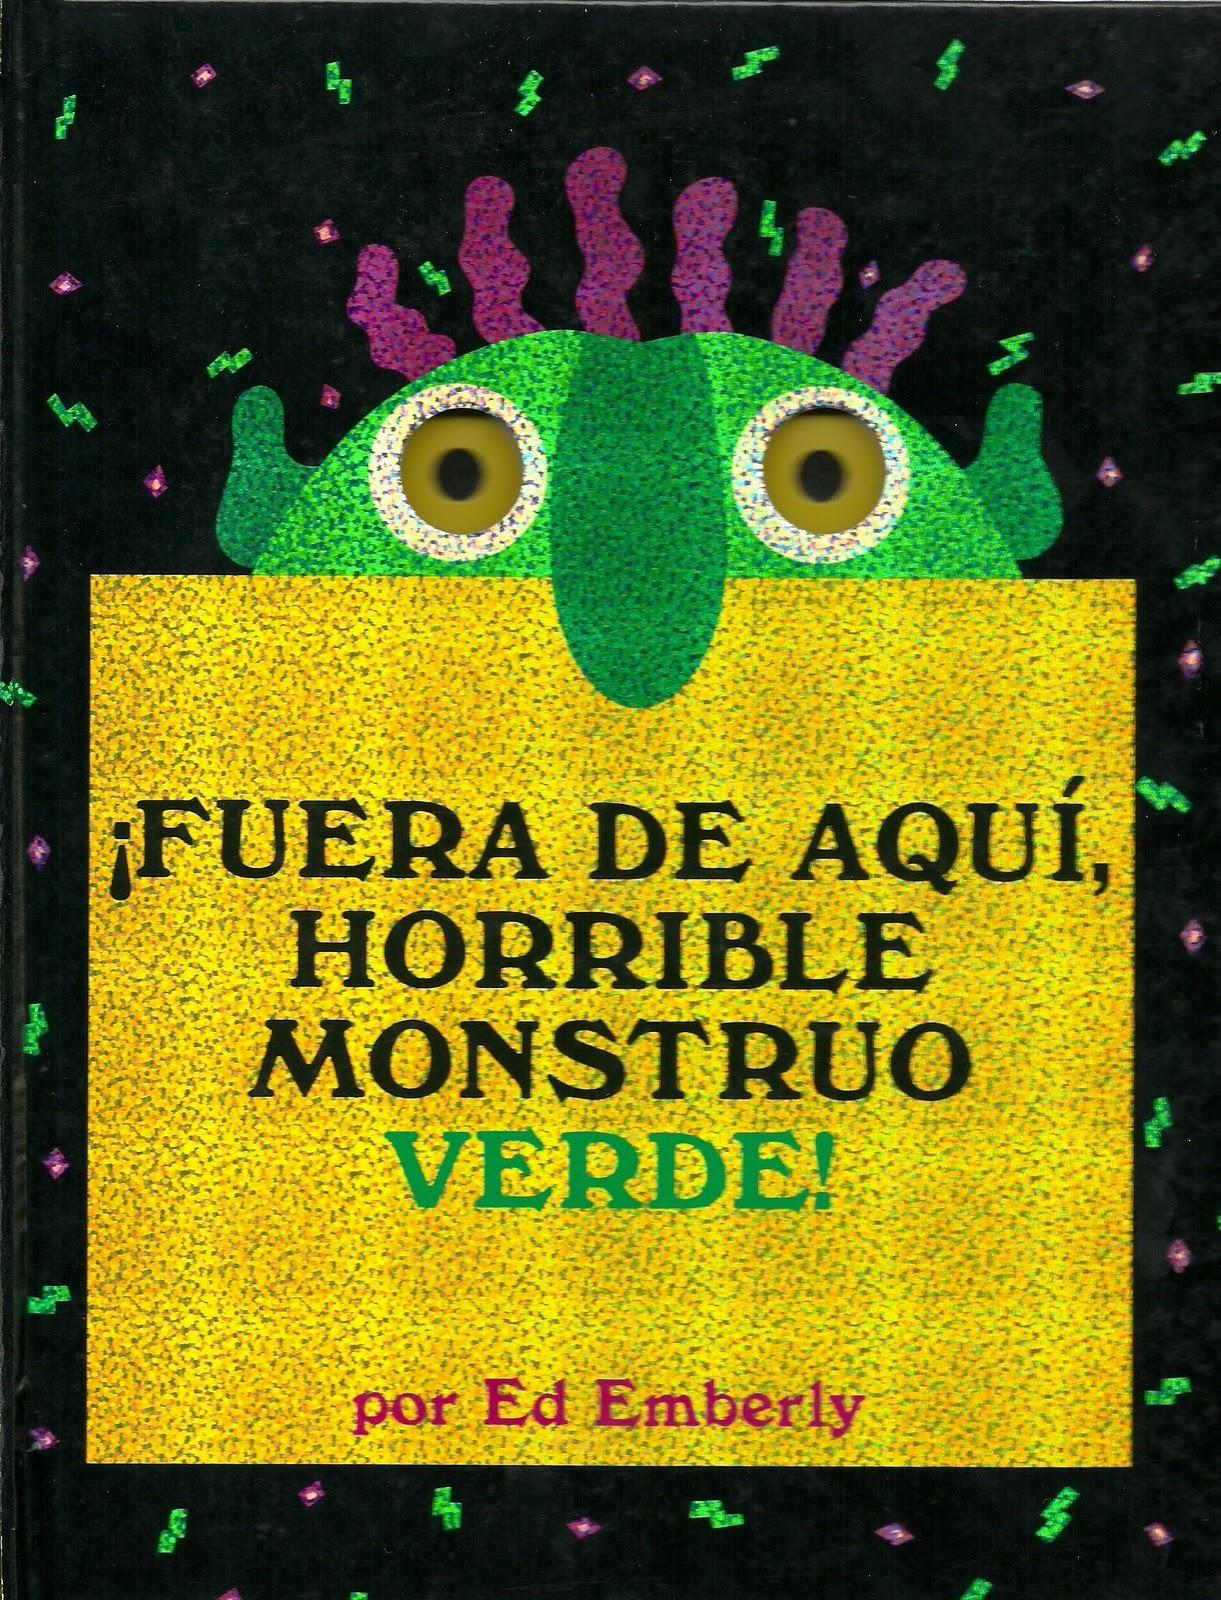 Talleres y lectura comentarios de libros for Fuera de aqui horrible monstruo verde actividades para ninos